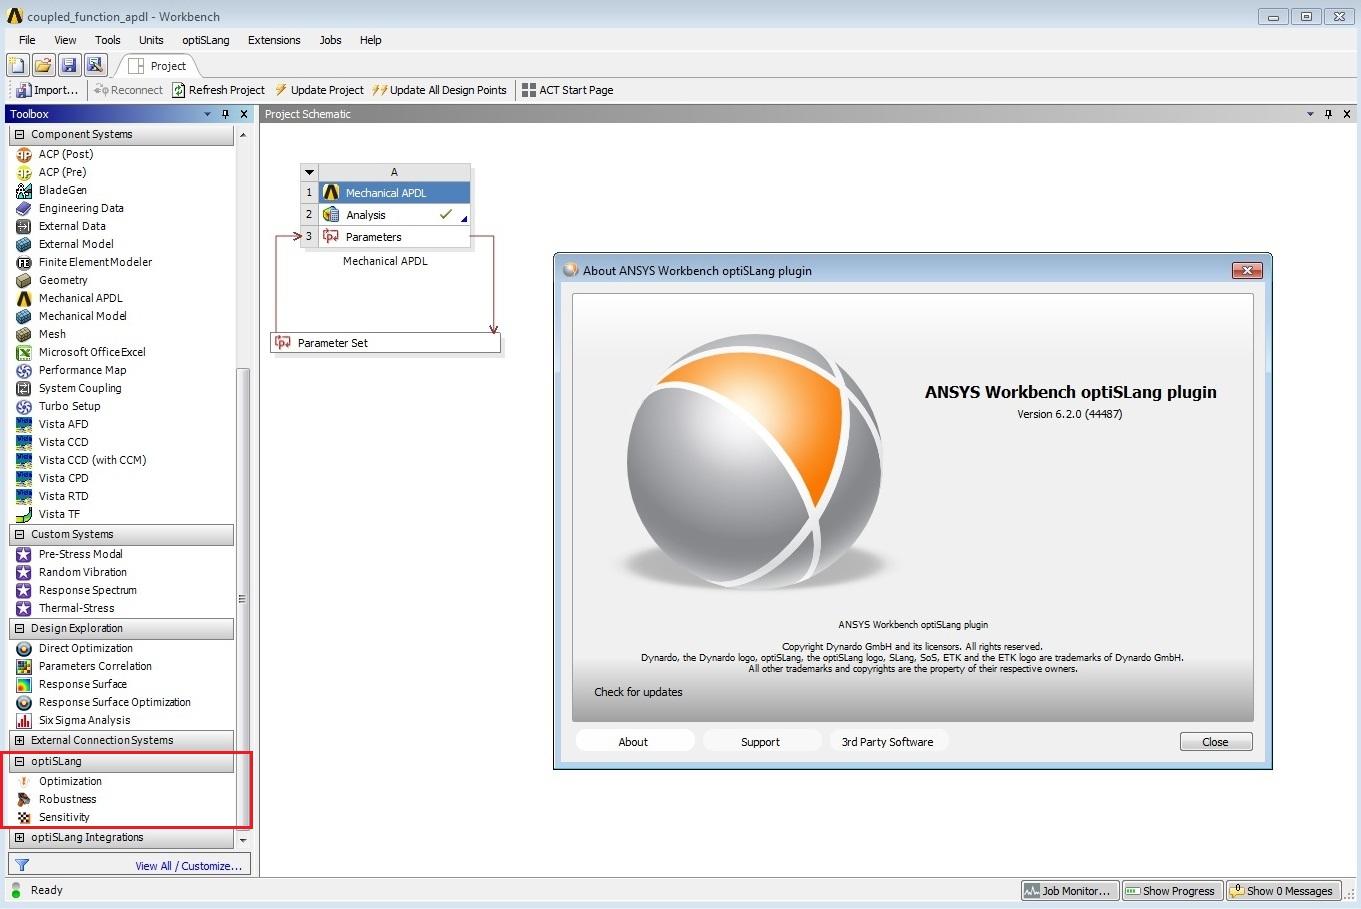 ANSYS optiSLang 6.2.0.44487 x64 full license